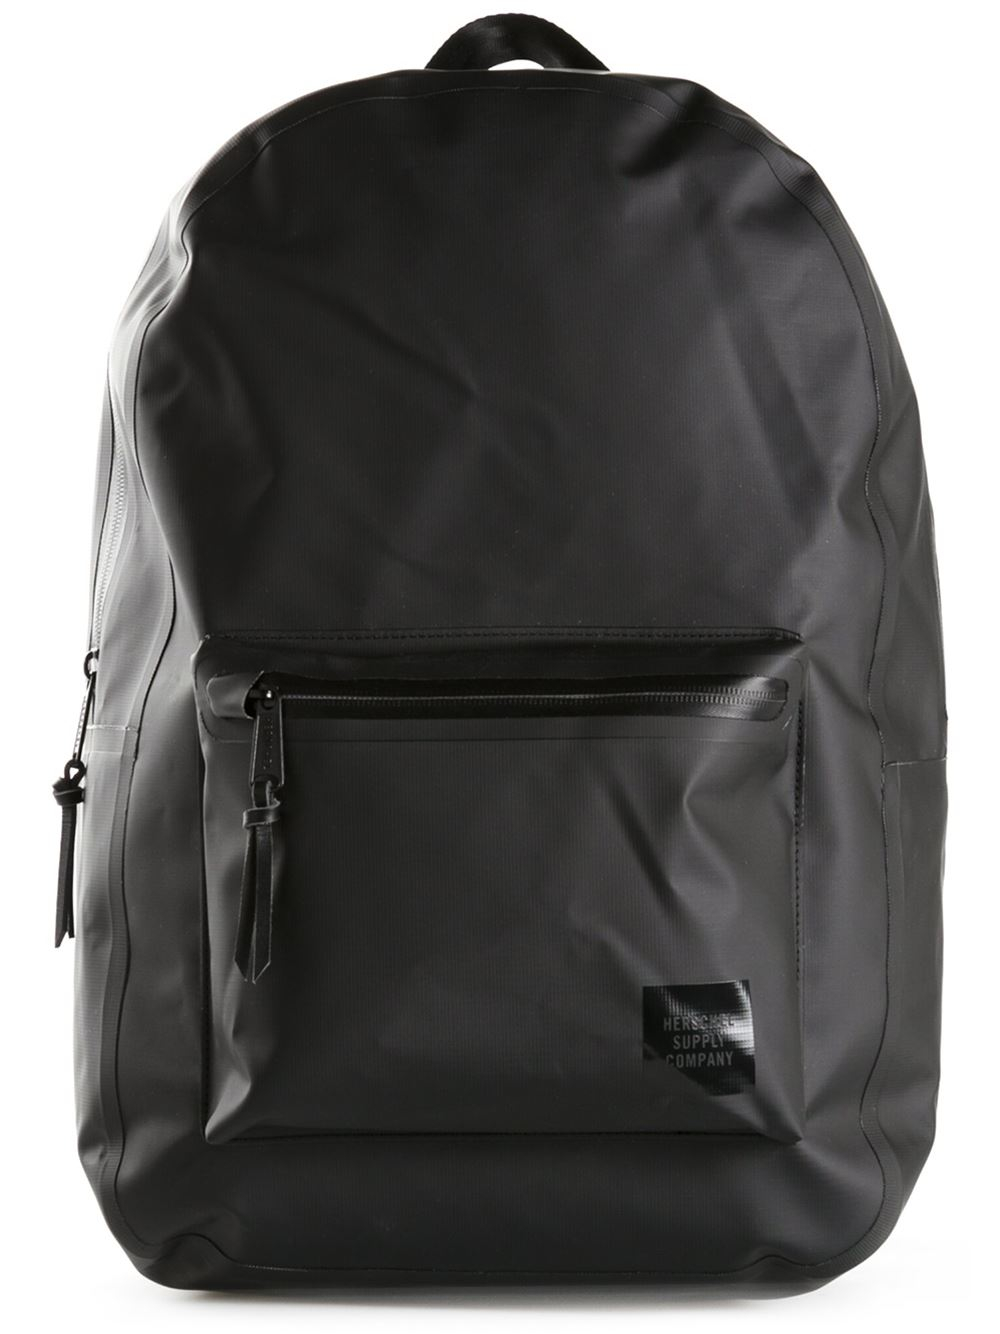 Herschel supply co. Classic Backpack in Black for Men | Lyst